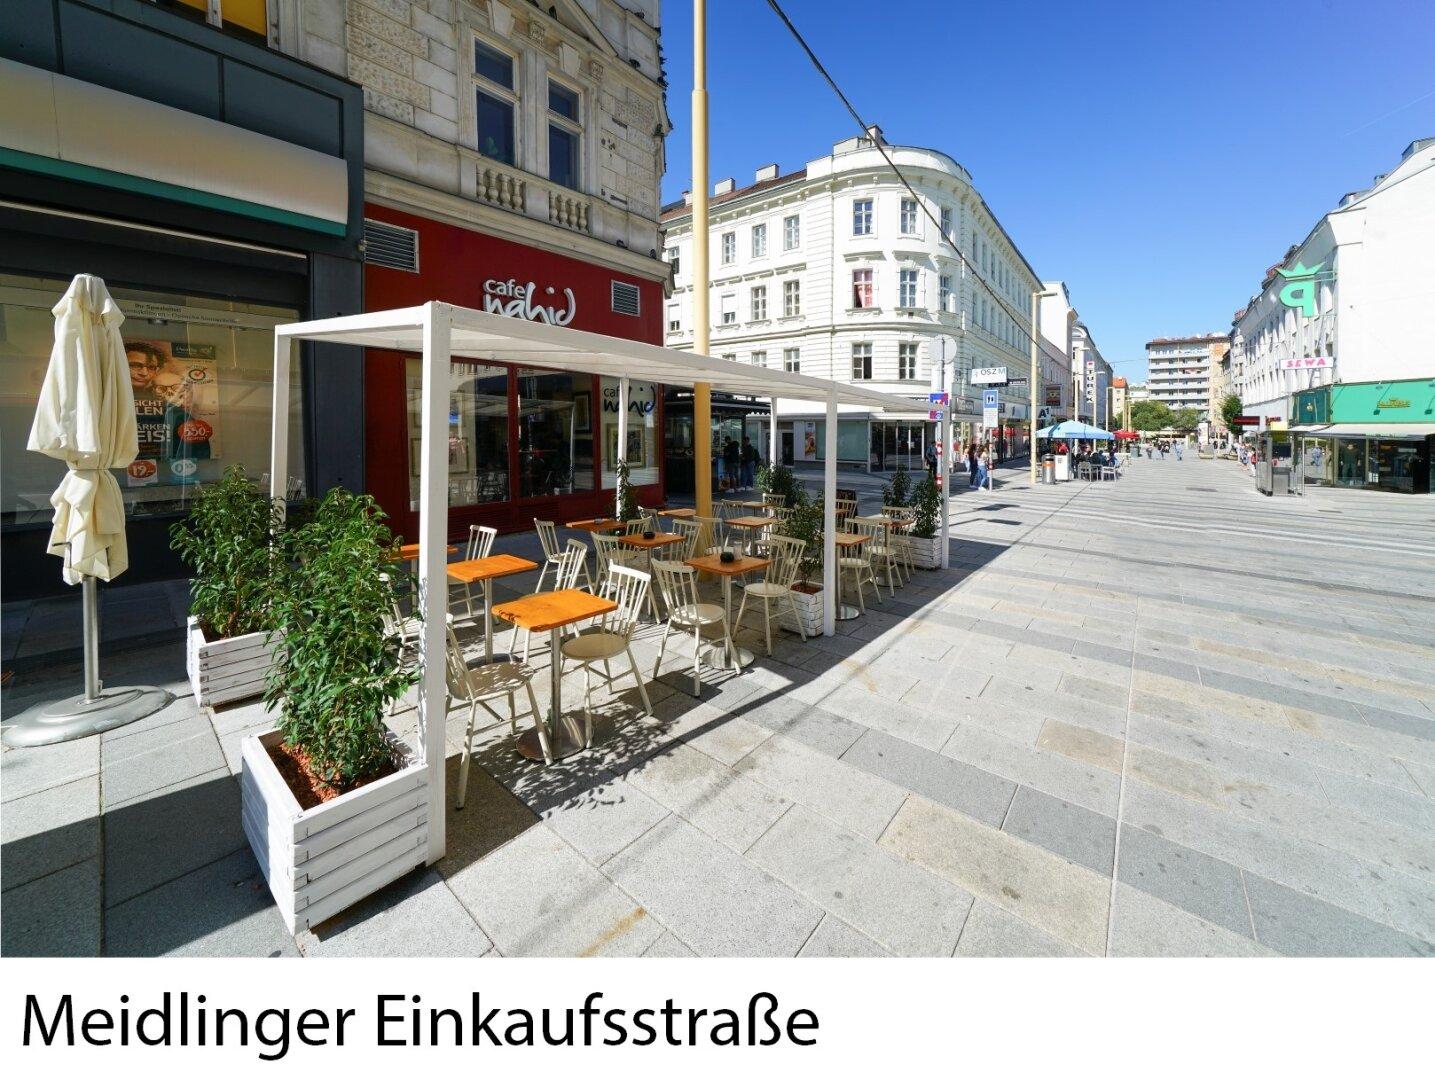 Meidlinger Einkaufsstraße